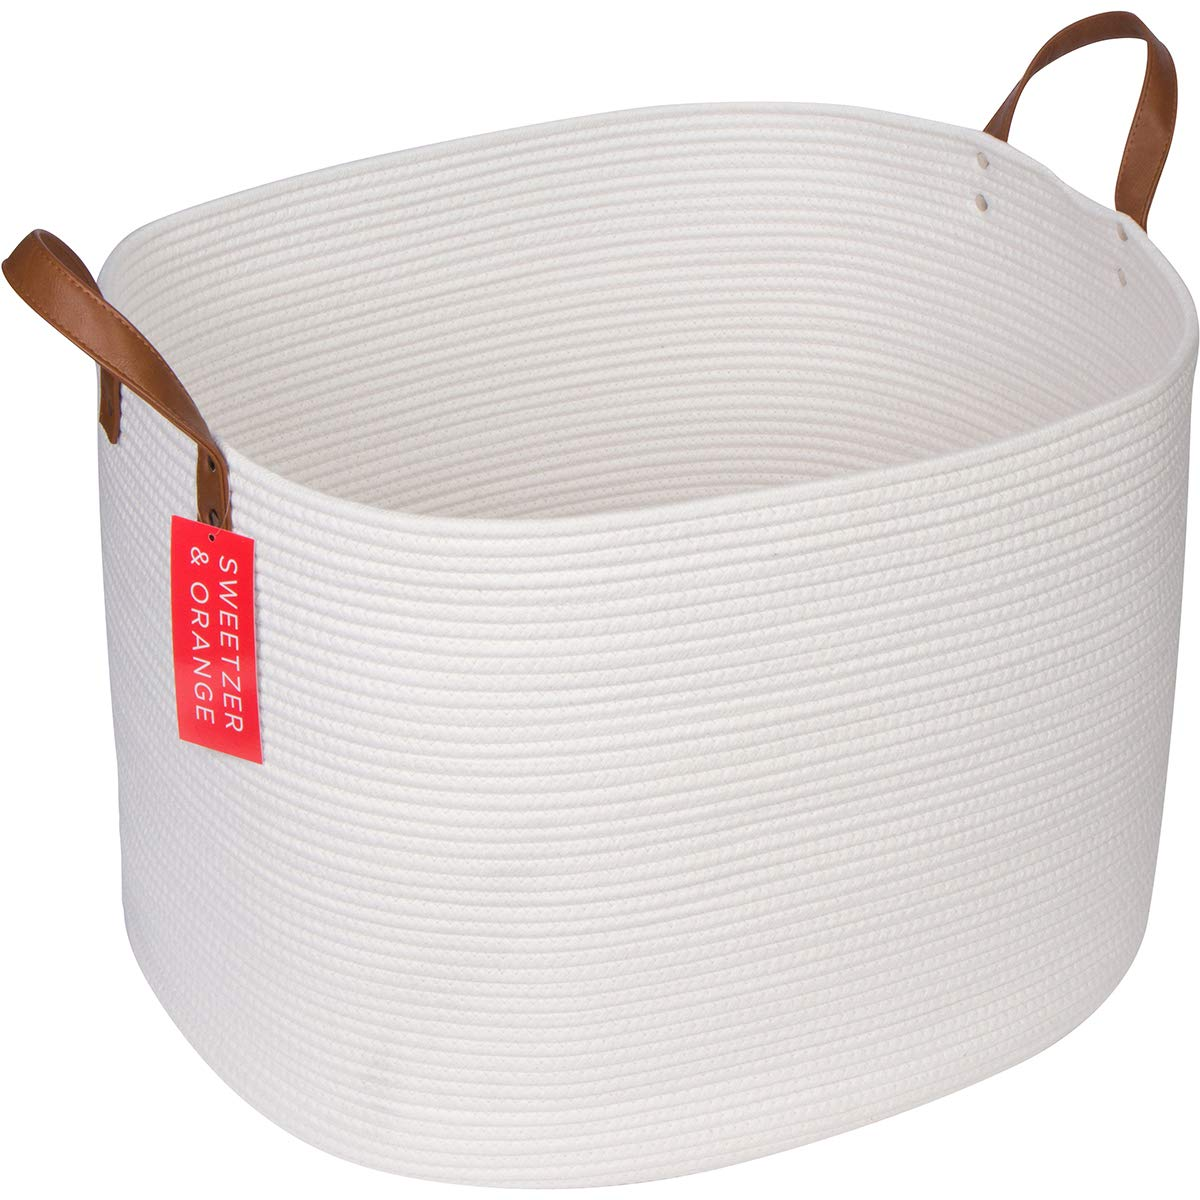 Sweetzer & Orange Extra Large Woven Cotton Rope Storage Basket - 23''x20.5''x15.5'' w/Vegan Leather - Blanket Storage Baskets, Laundry and Toy Storage, Nursery Hamper - Off White XXL for Living Room by Sweetzer & Orange